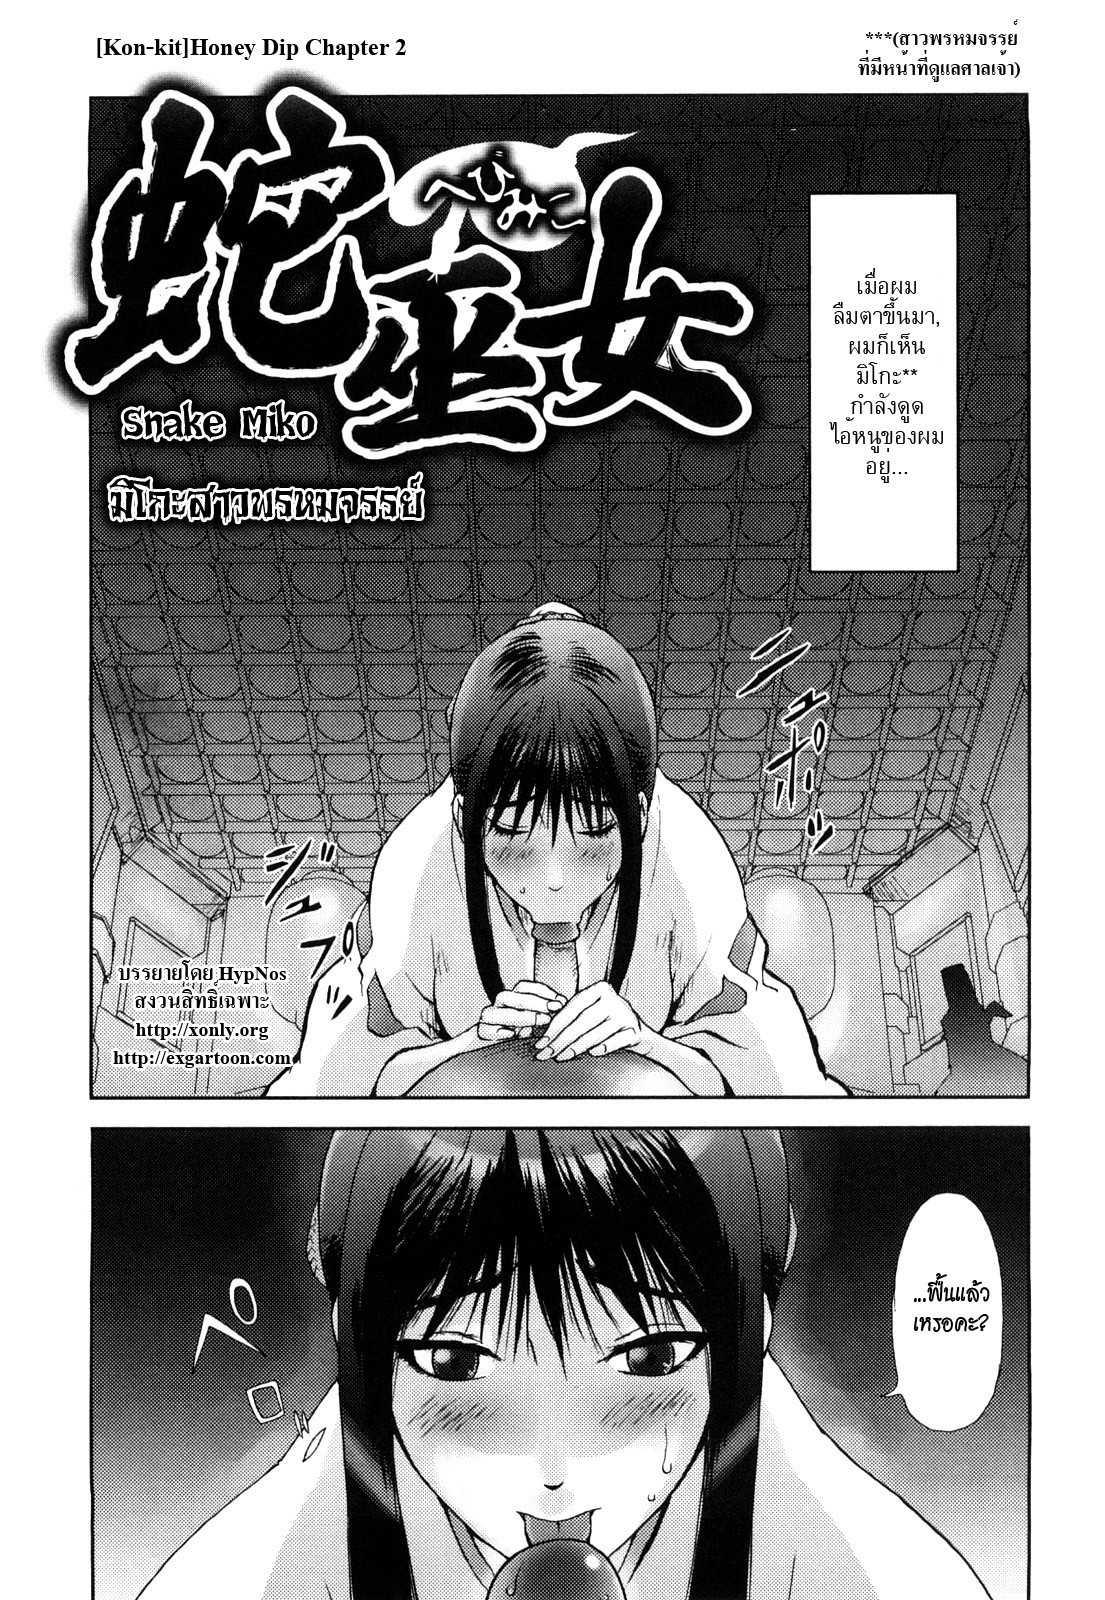 kon-kit-honey-dip-chapter-2-snake-miko